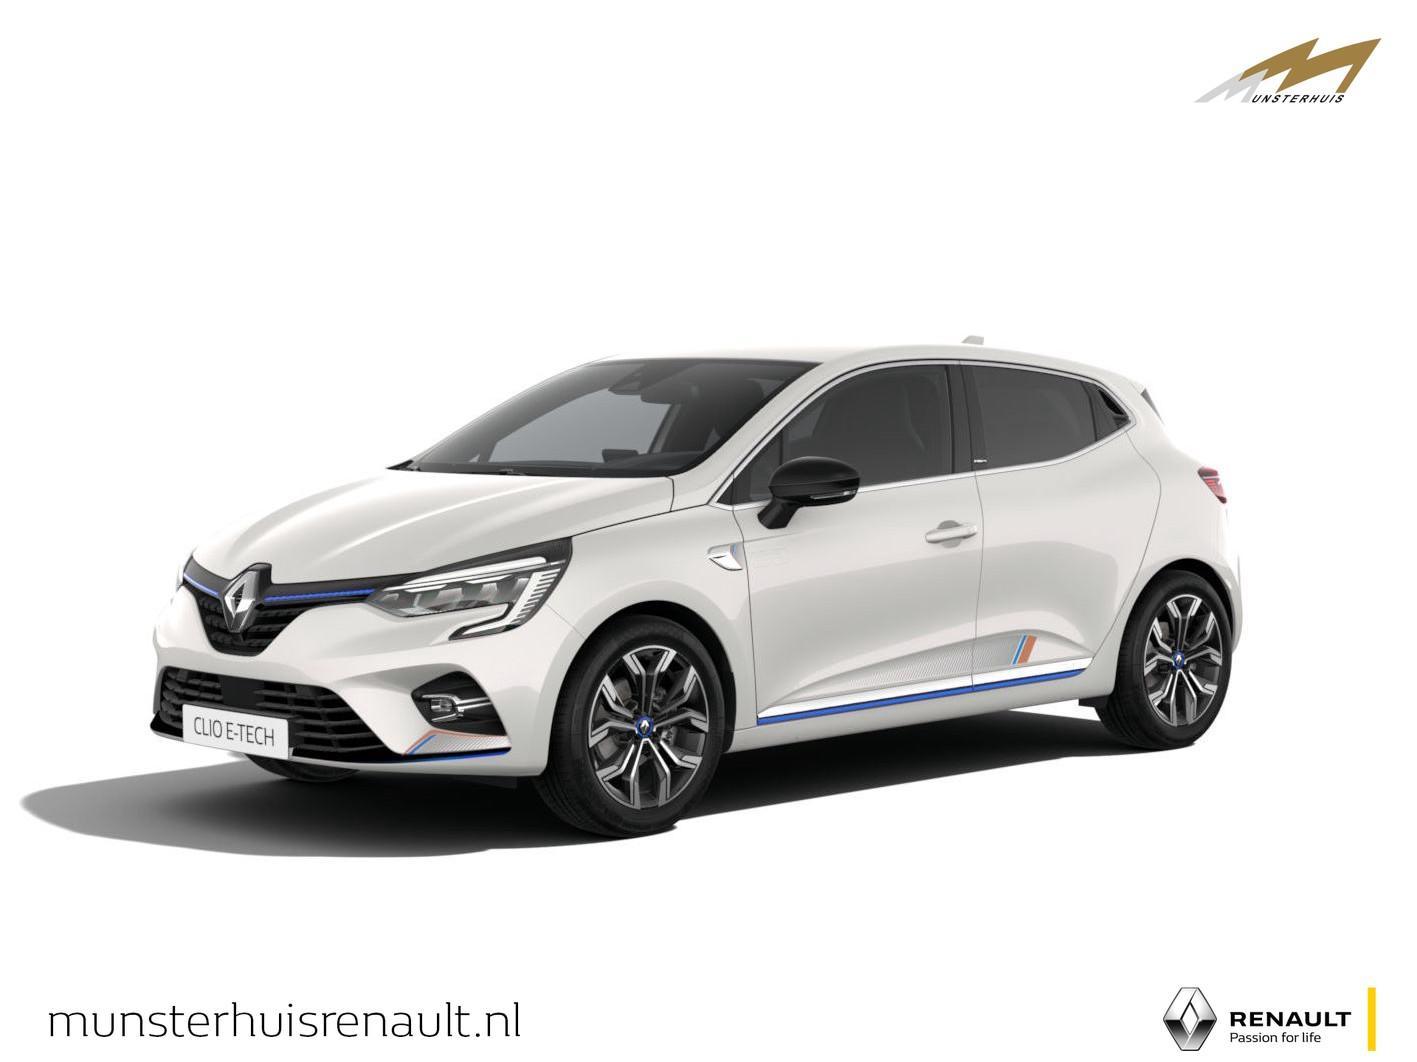 Renault Clio Hybrid 140 série limitée e-tech - nieuw - hybride - wordt verwacht !